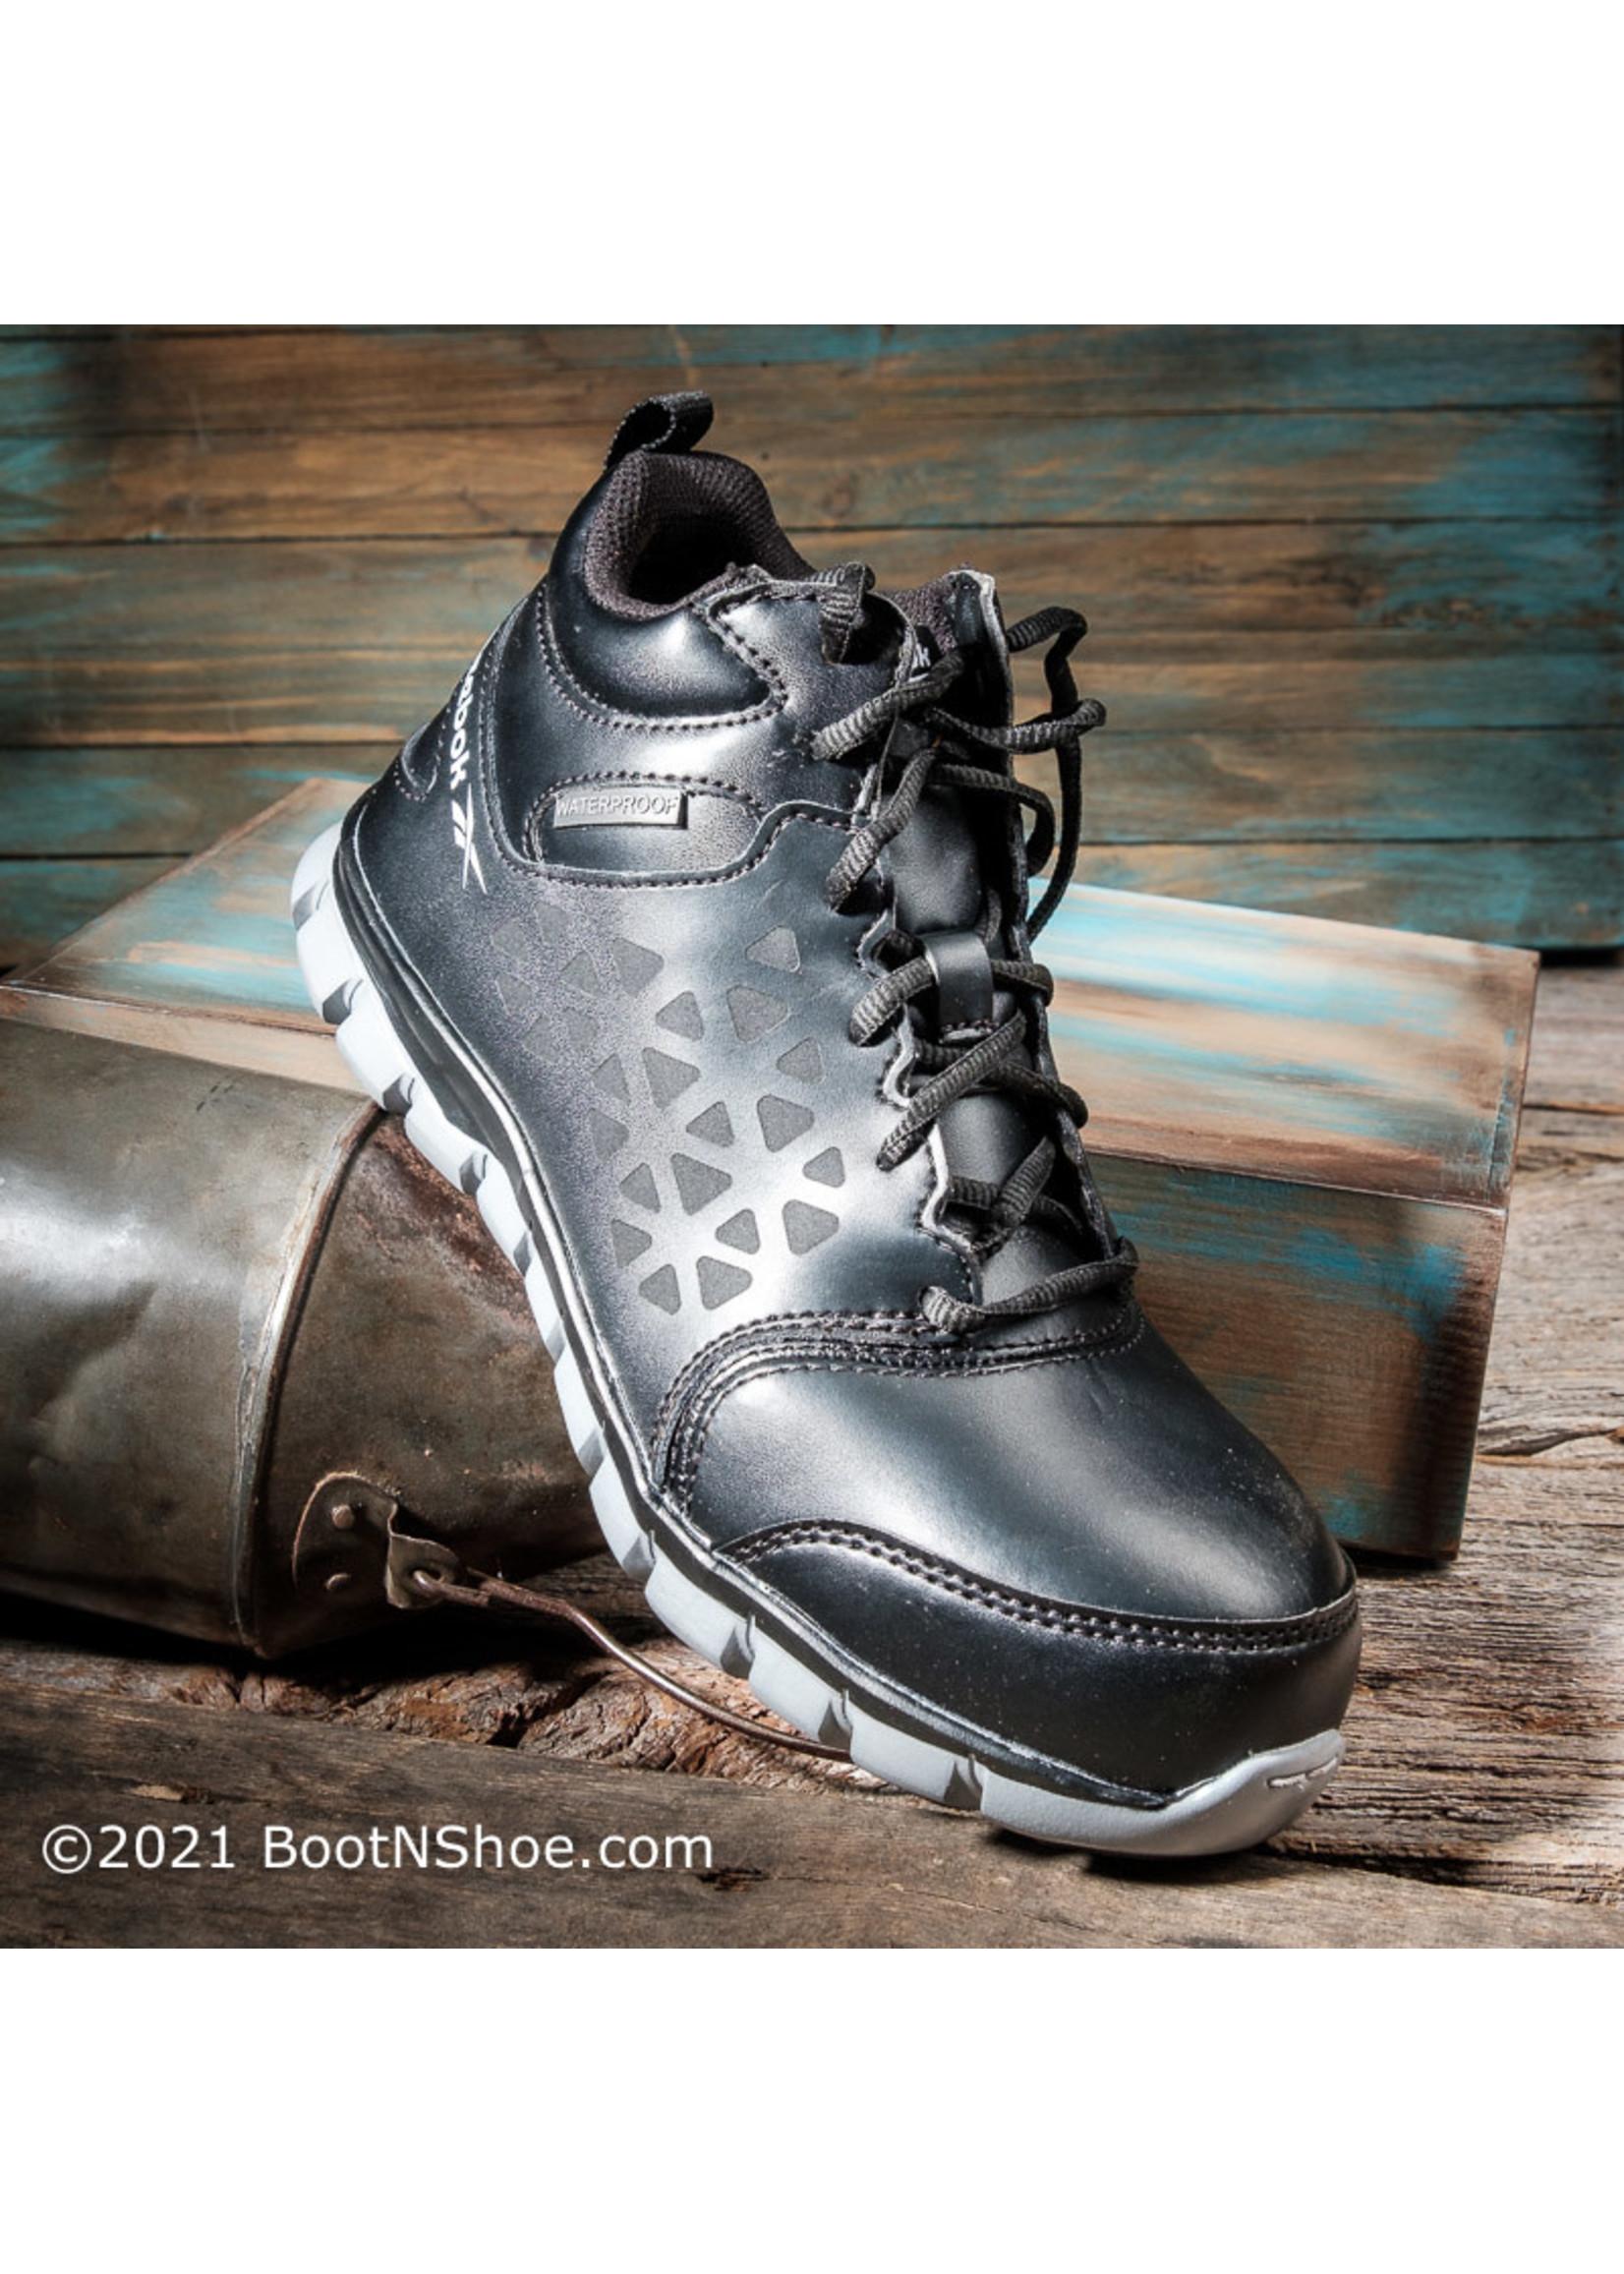 Reebok Women's Waterproof Sublite Cushion Composite Work Shoe RB414